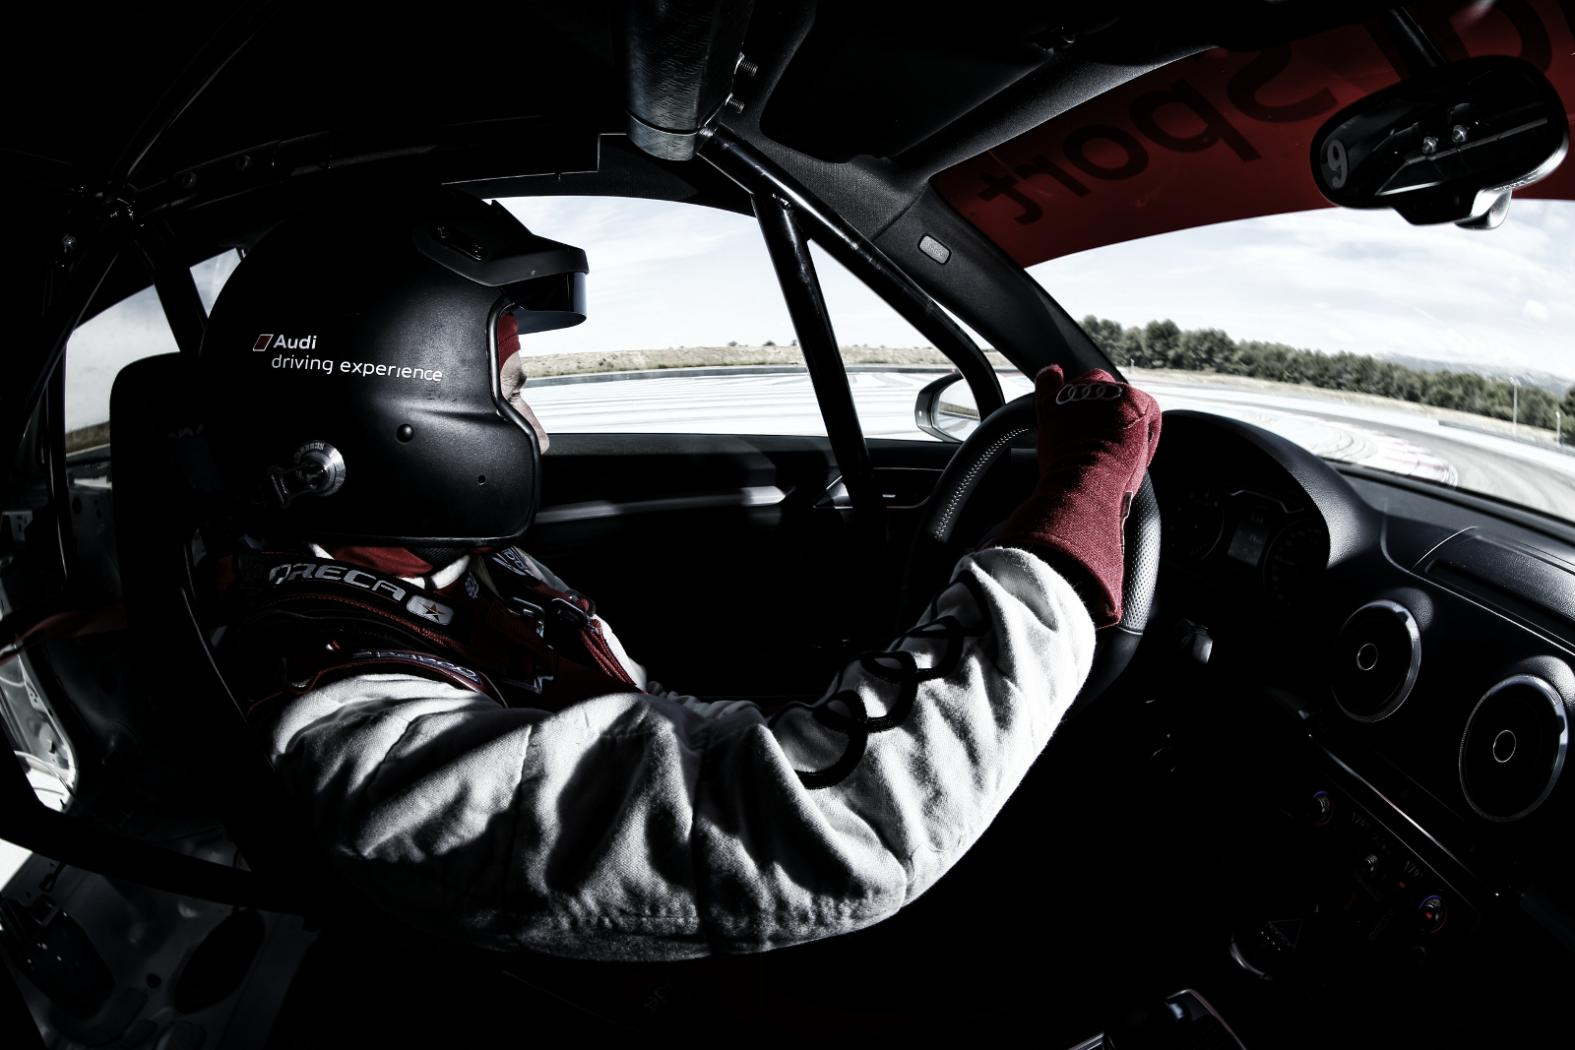 4-Audi-endurance-experience-2016.jpeg